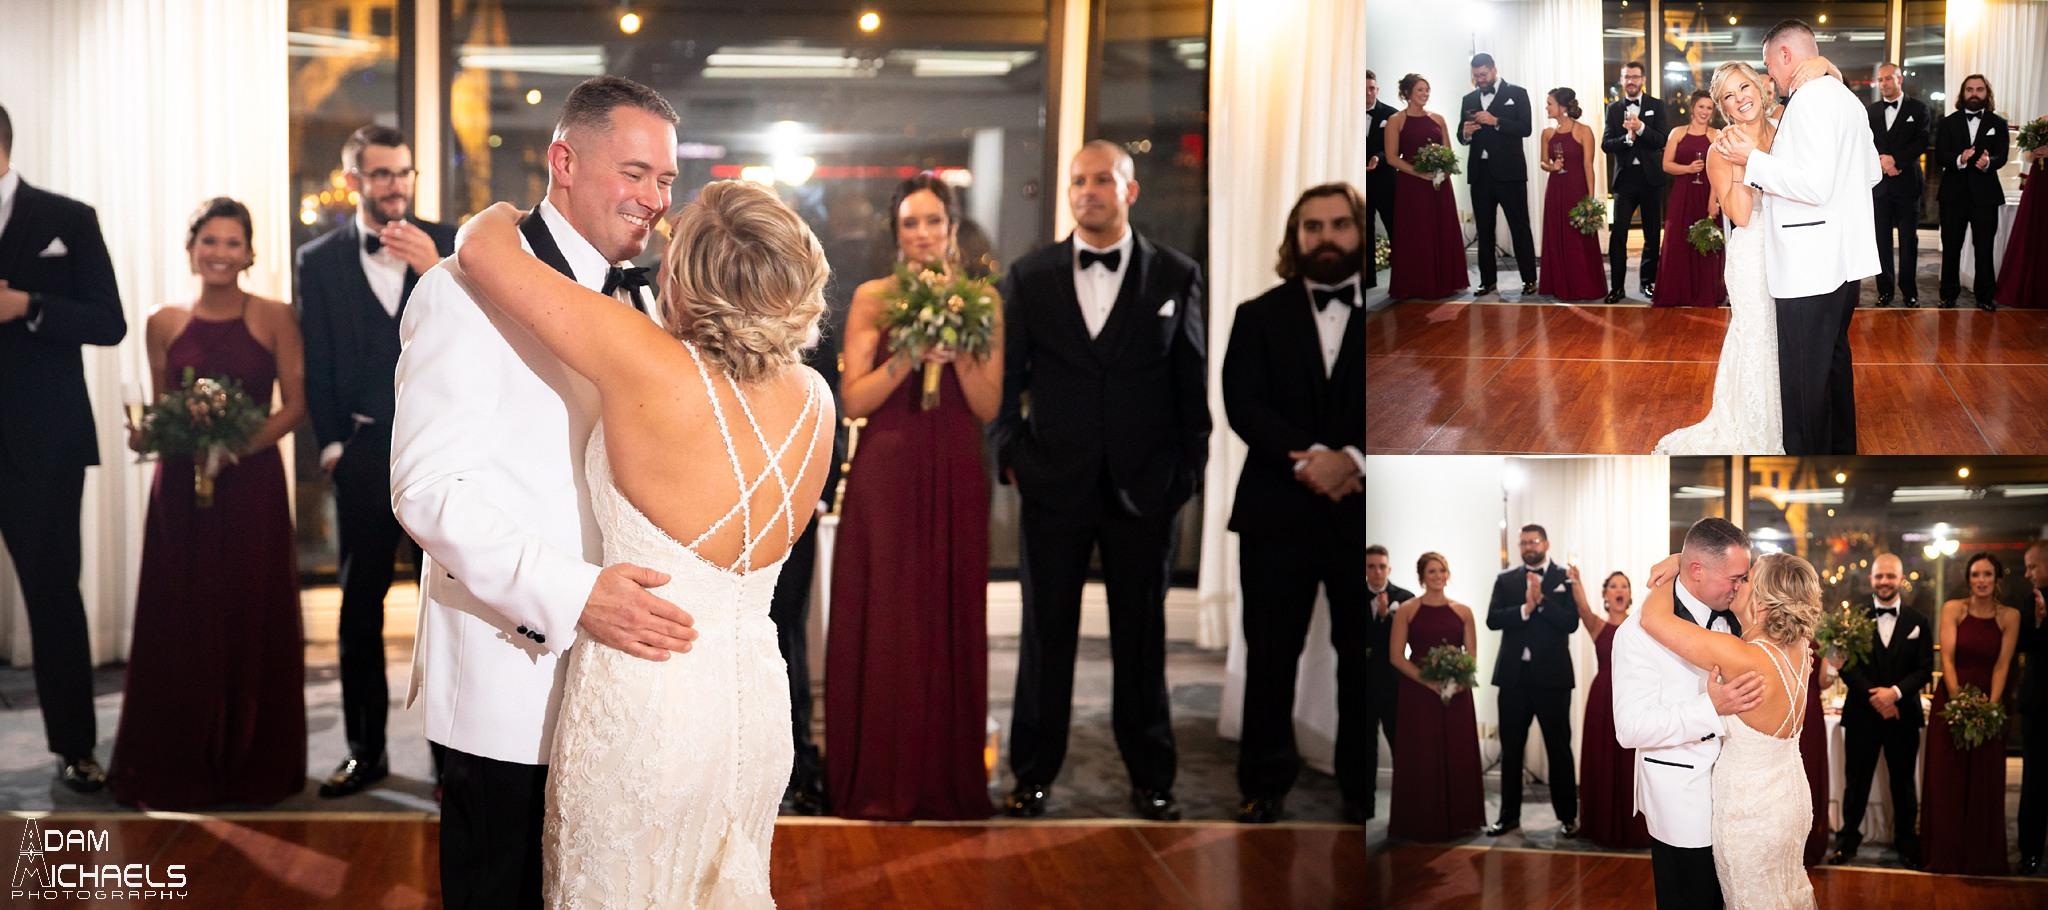 Pittsburgh Renaissance Hotel Wedding Reception Pictures_2959.jpg